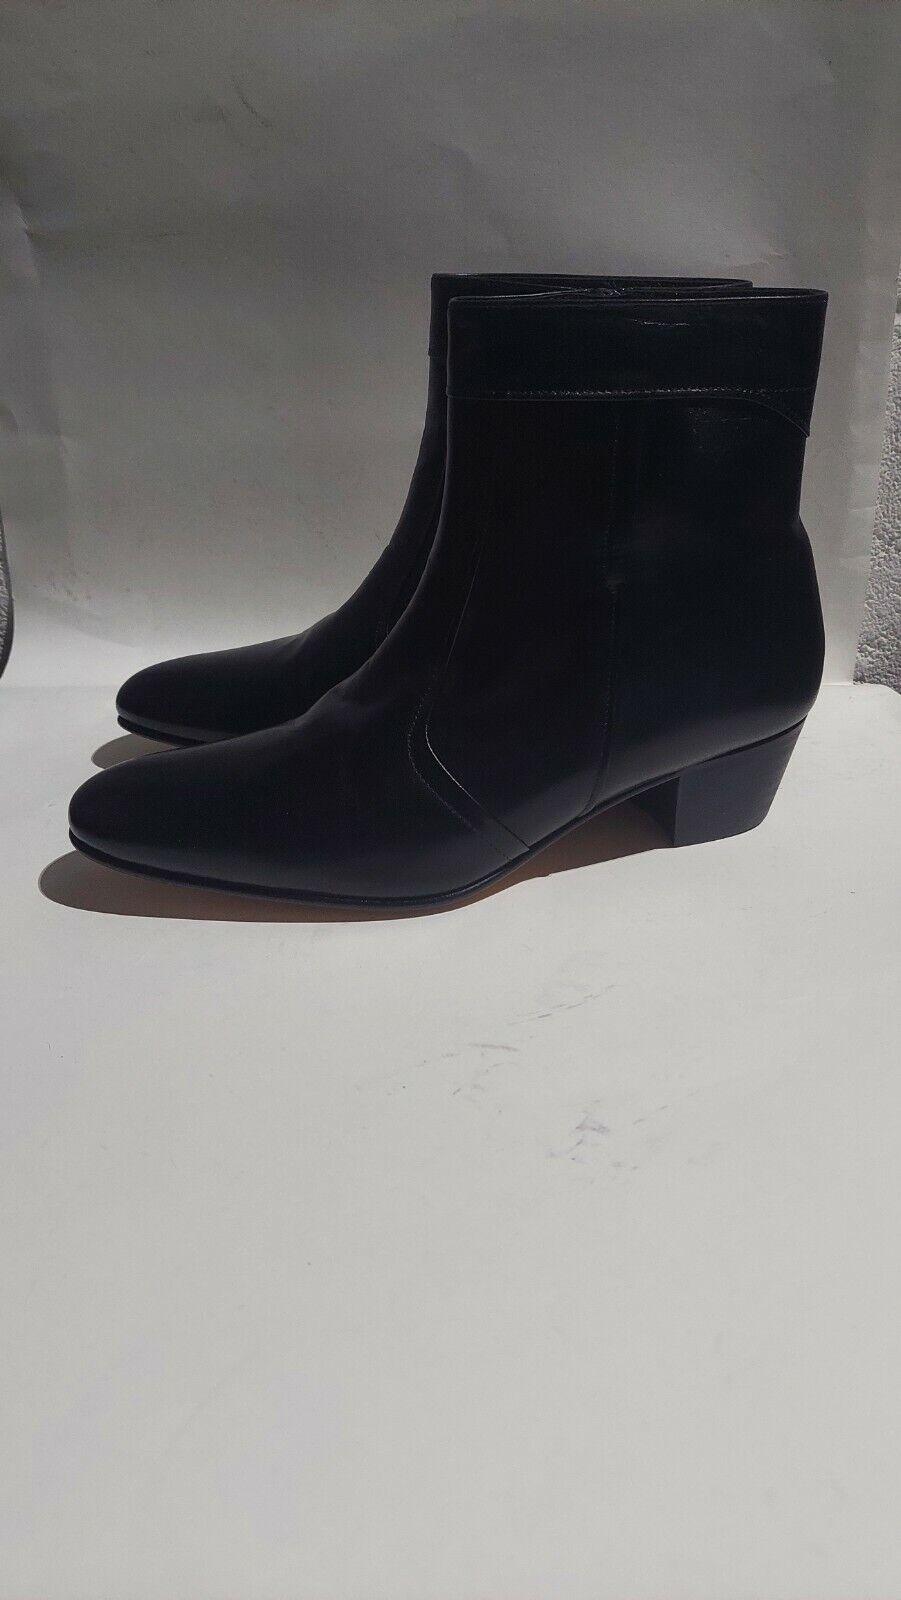 SHUPERB Mens Leather Smart Cuban Heel Ankle Boots UK Size 8.5#761